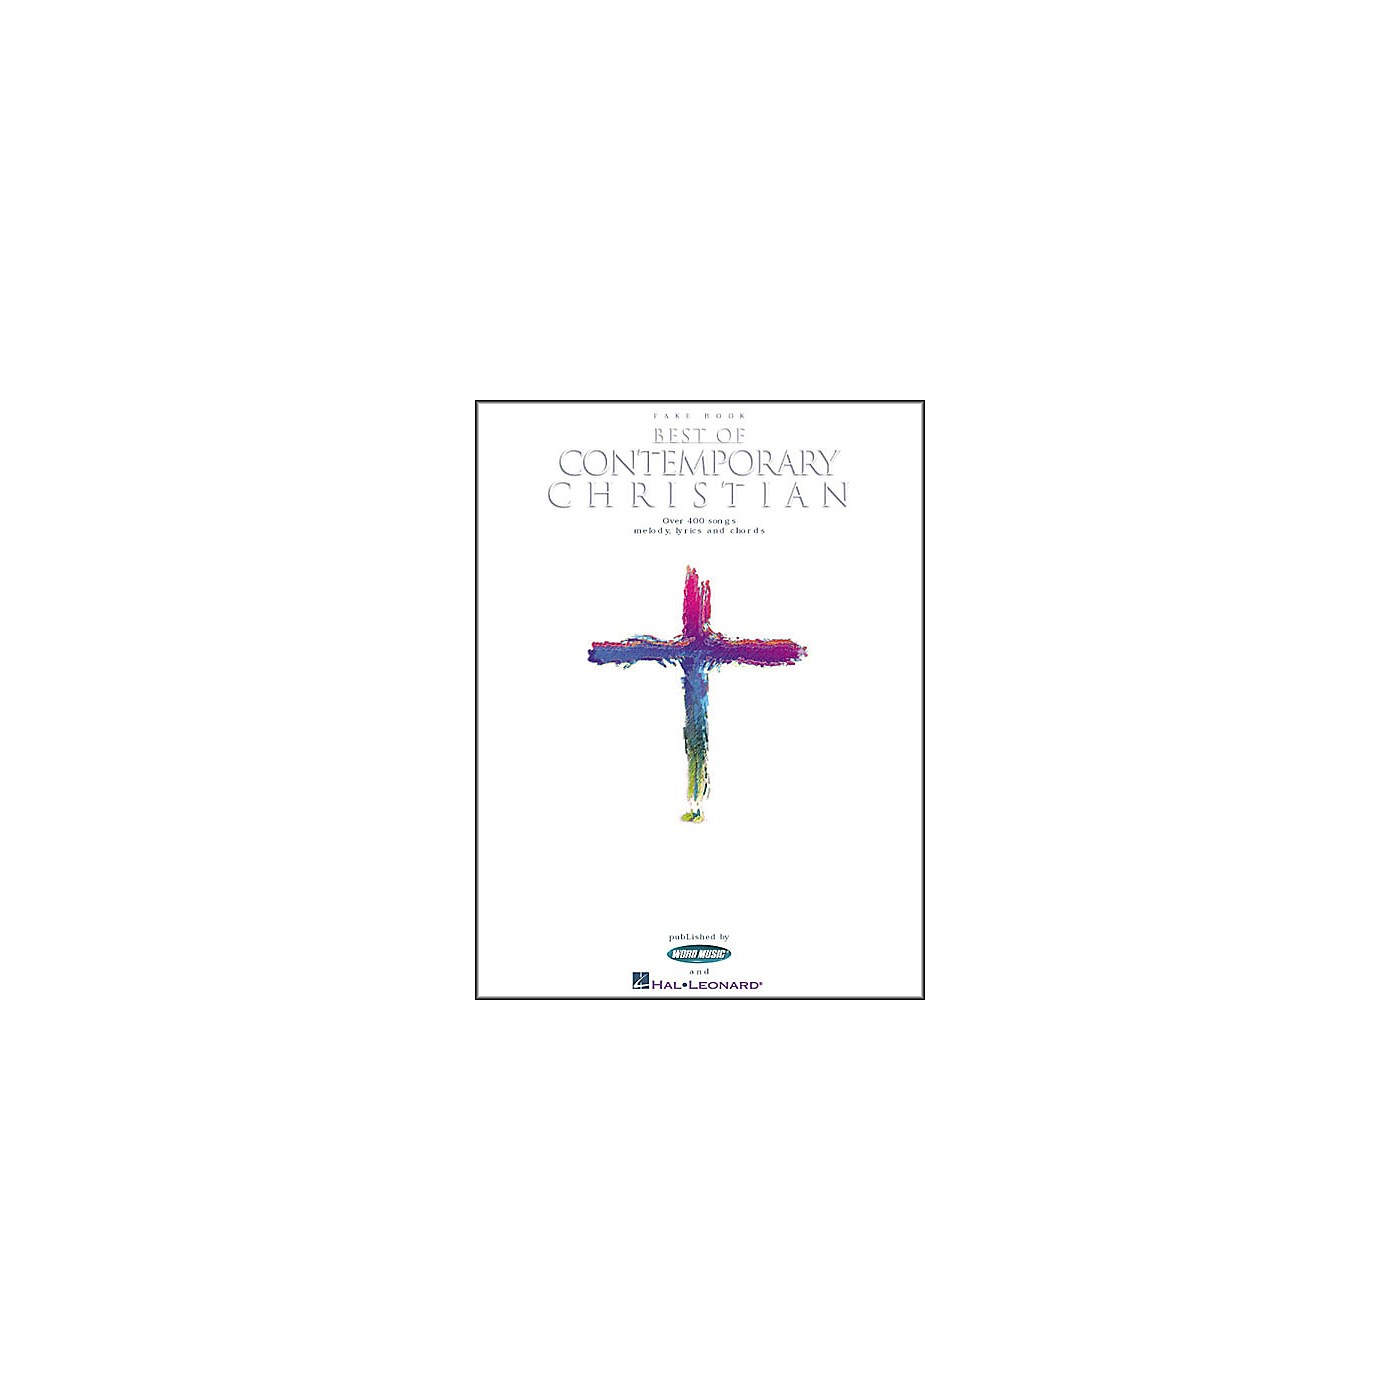 Hal Leonard Best of Contemporary Christian Fake Book thumbnail